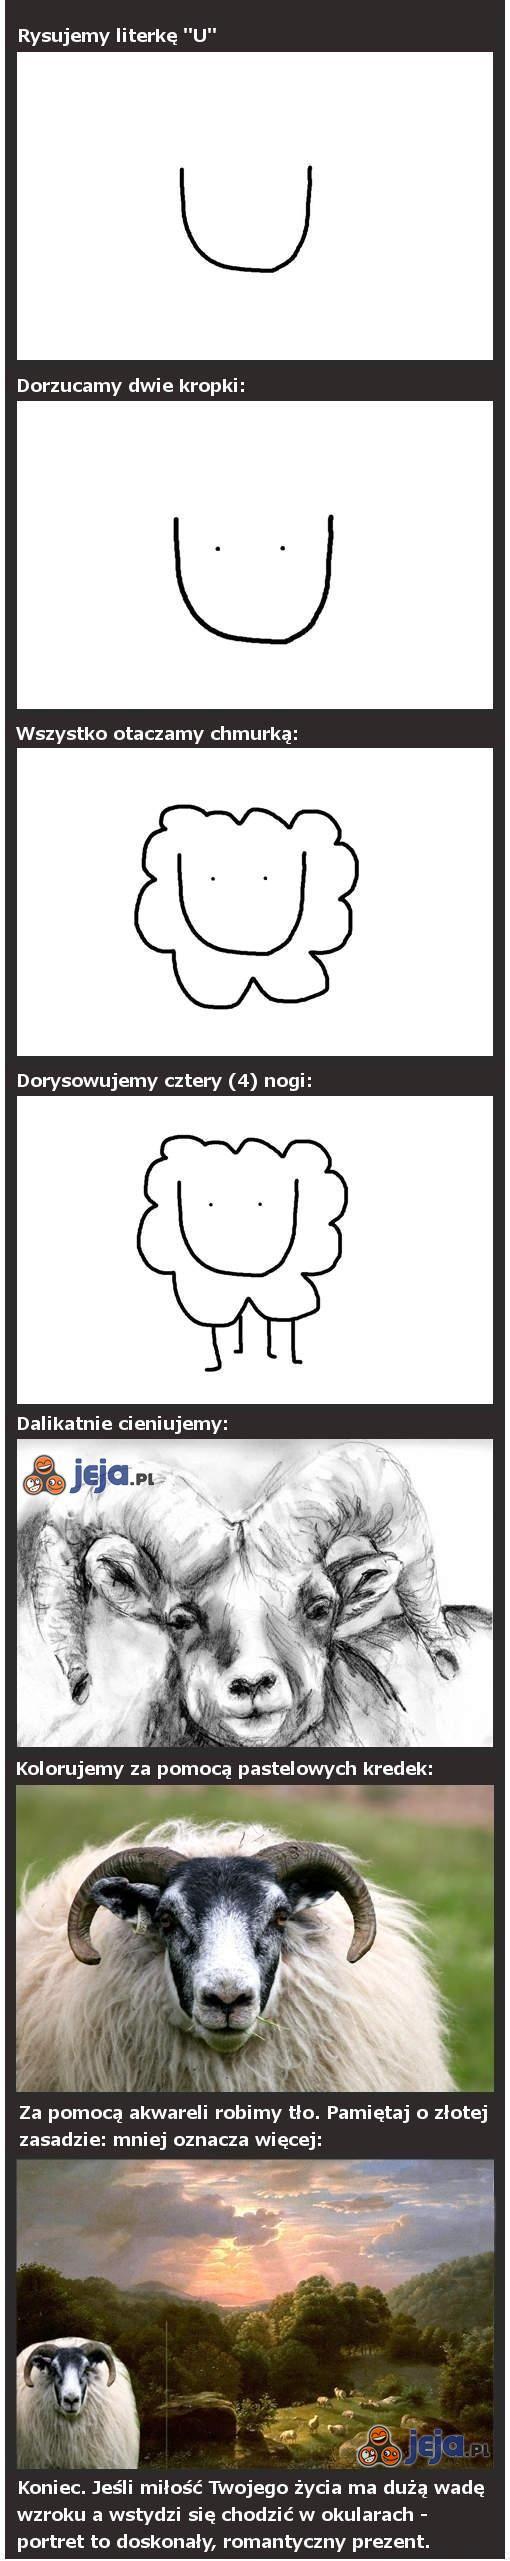 Jak narysować barana